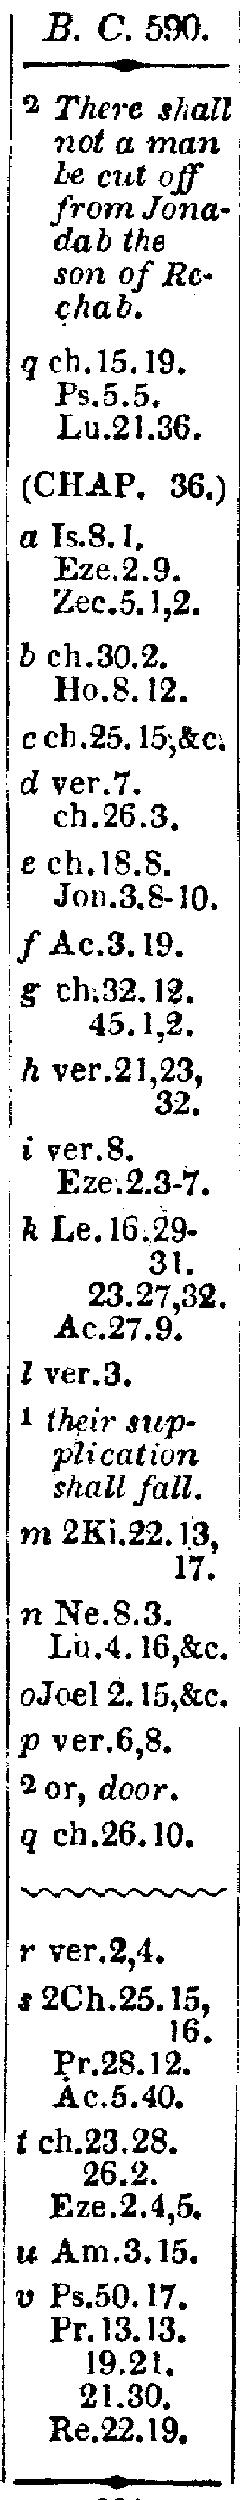 [merged small][merged small][ocr errors][ocr errors][ocr errors][merged small][merged small][ocr errors][ocr errors][ocr errors][merged small][ocr errors][ocr errors][ocr errors][ocr errors][ocr errors]